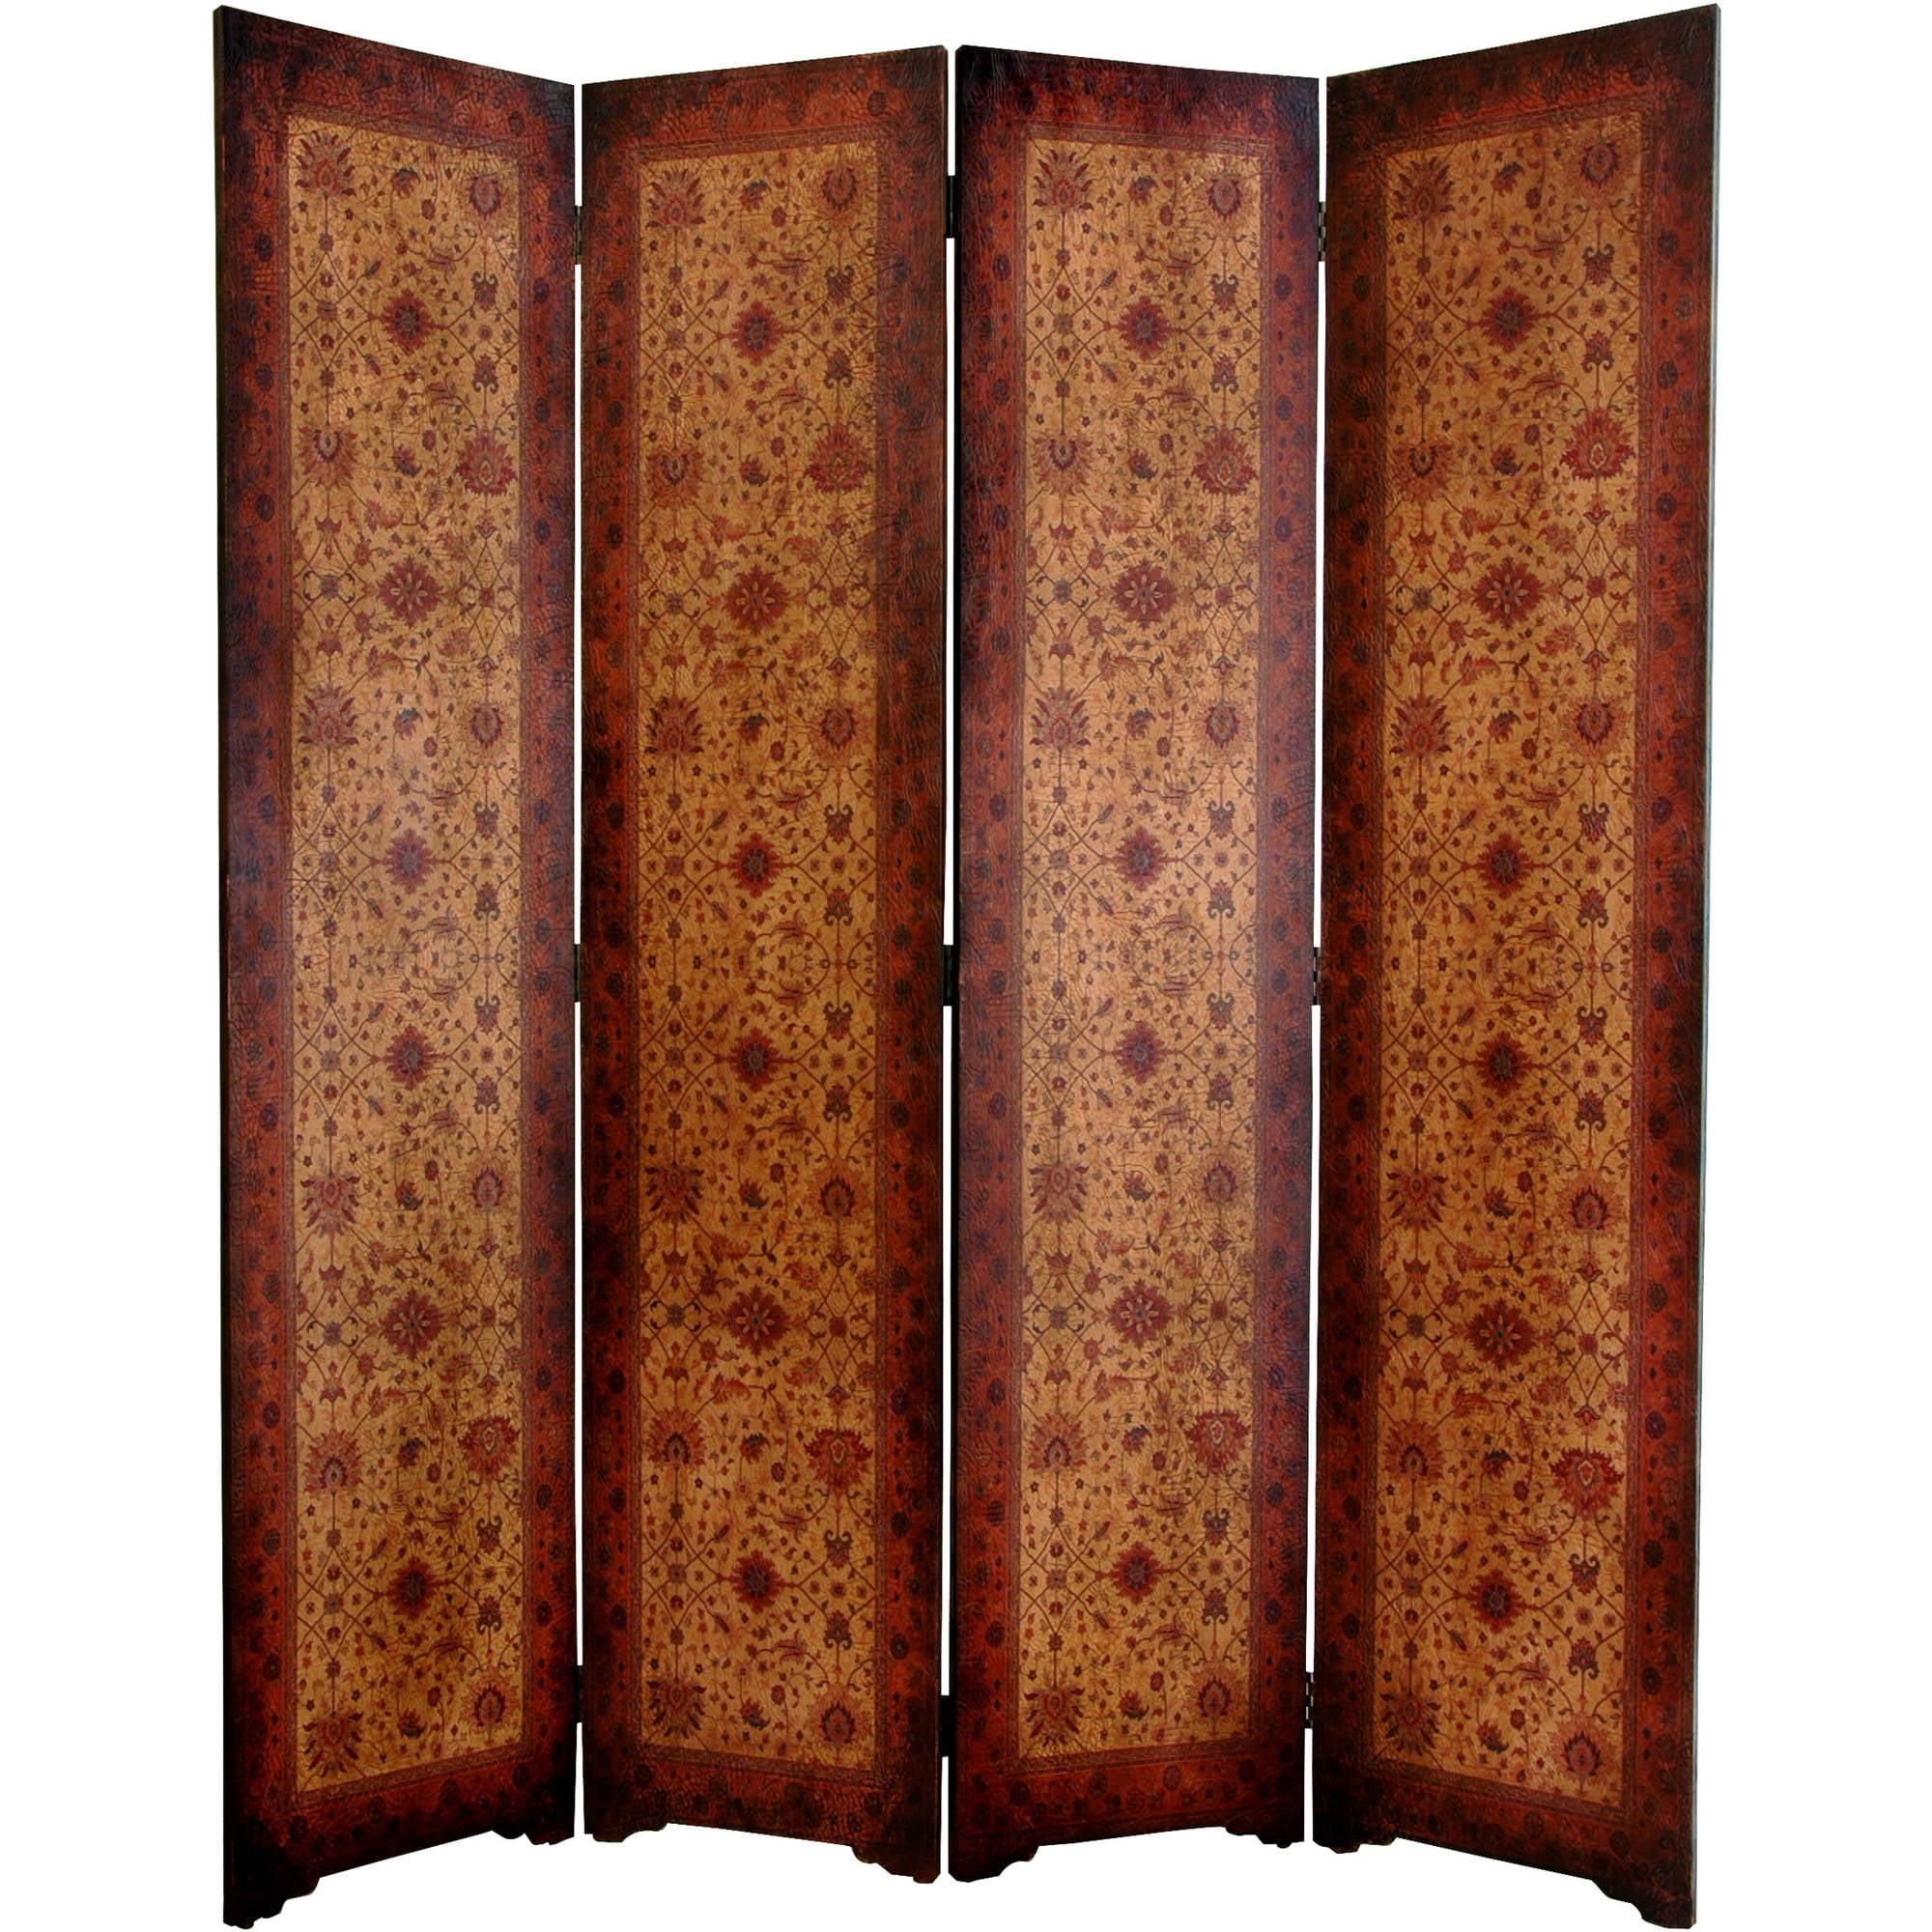 6' Tall Olde-Worlde Victorian Room Divider